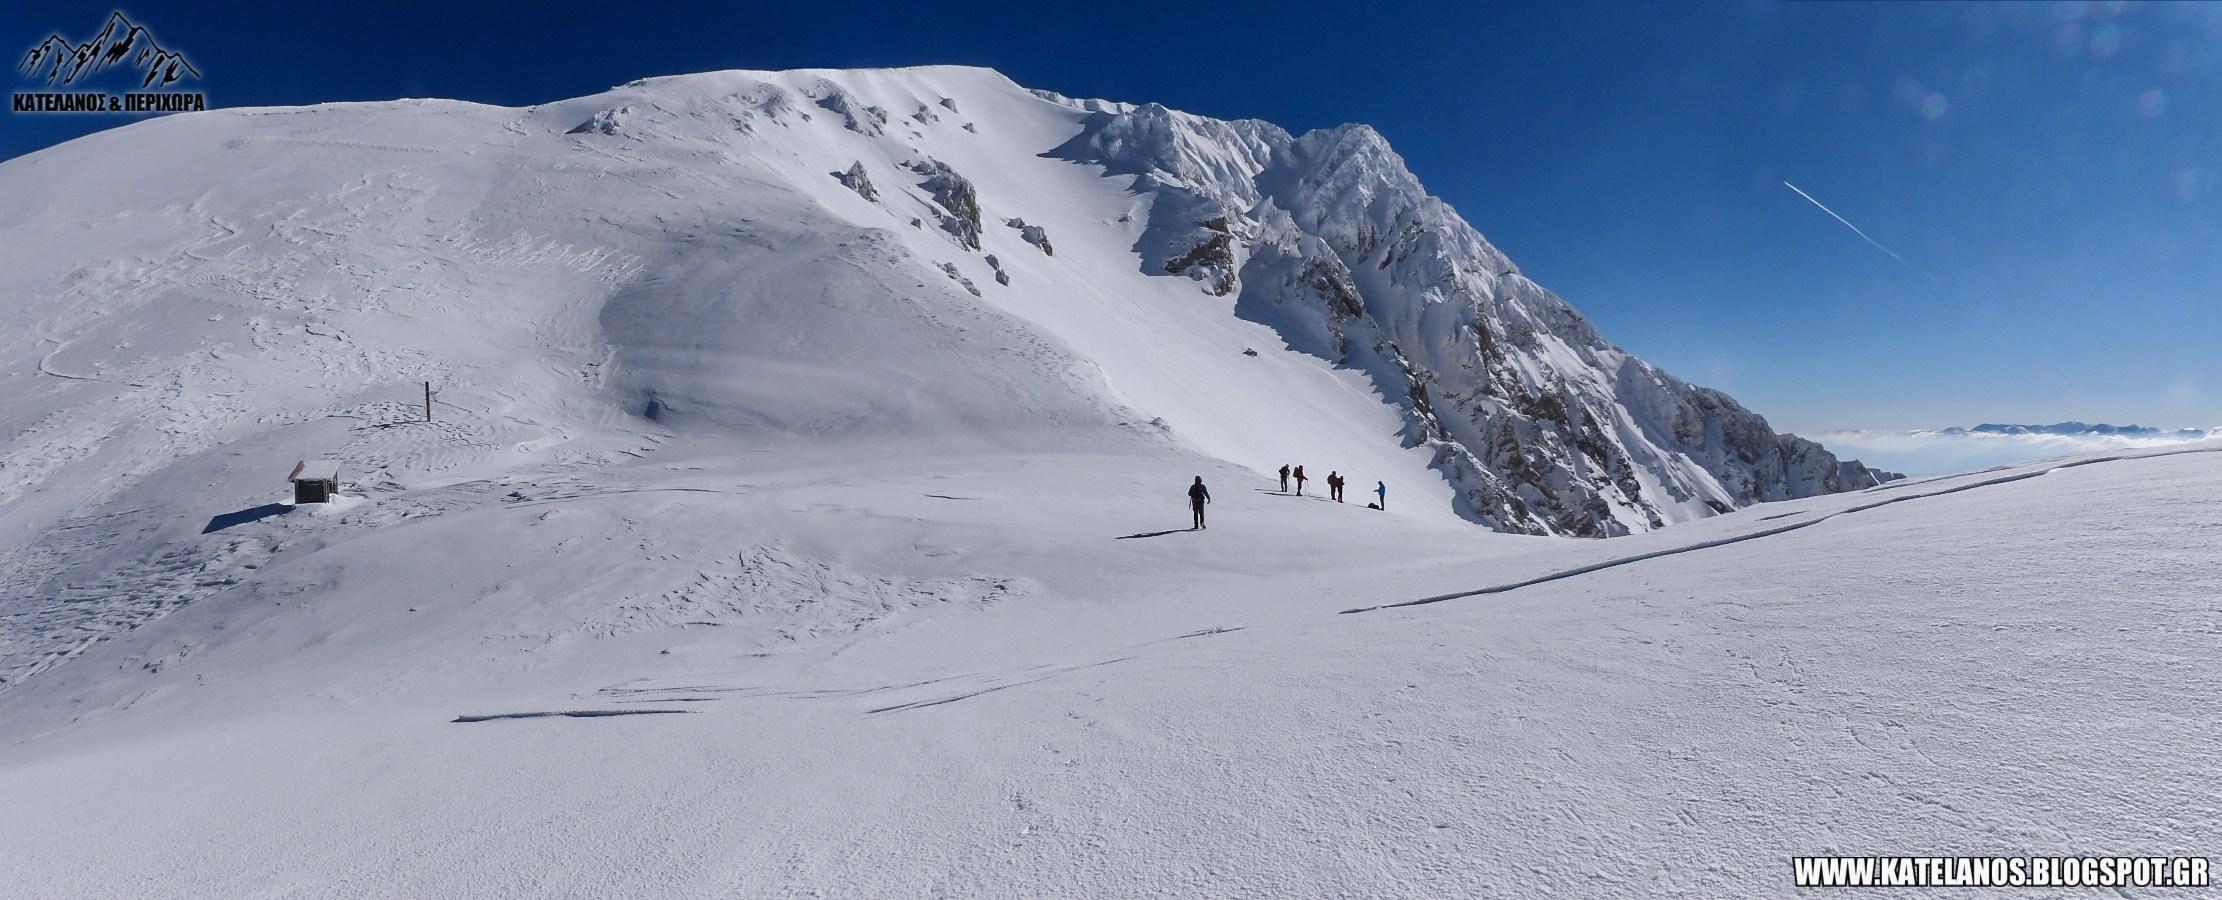 psili korifi velouxi velouchi mountain karpenisi βελούχι τυμφρηστός ψηλή κορυφή